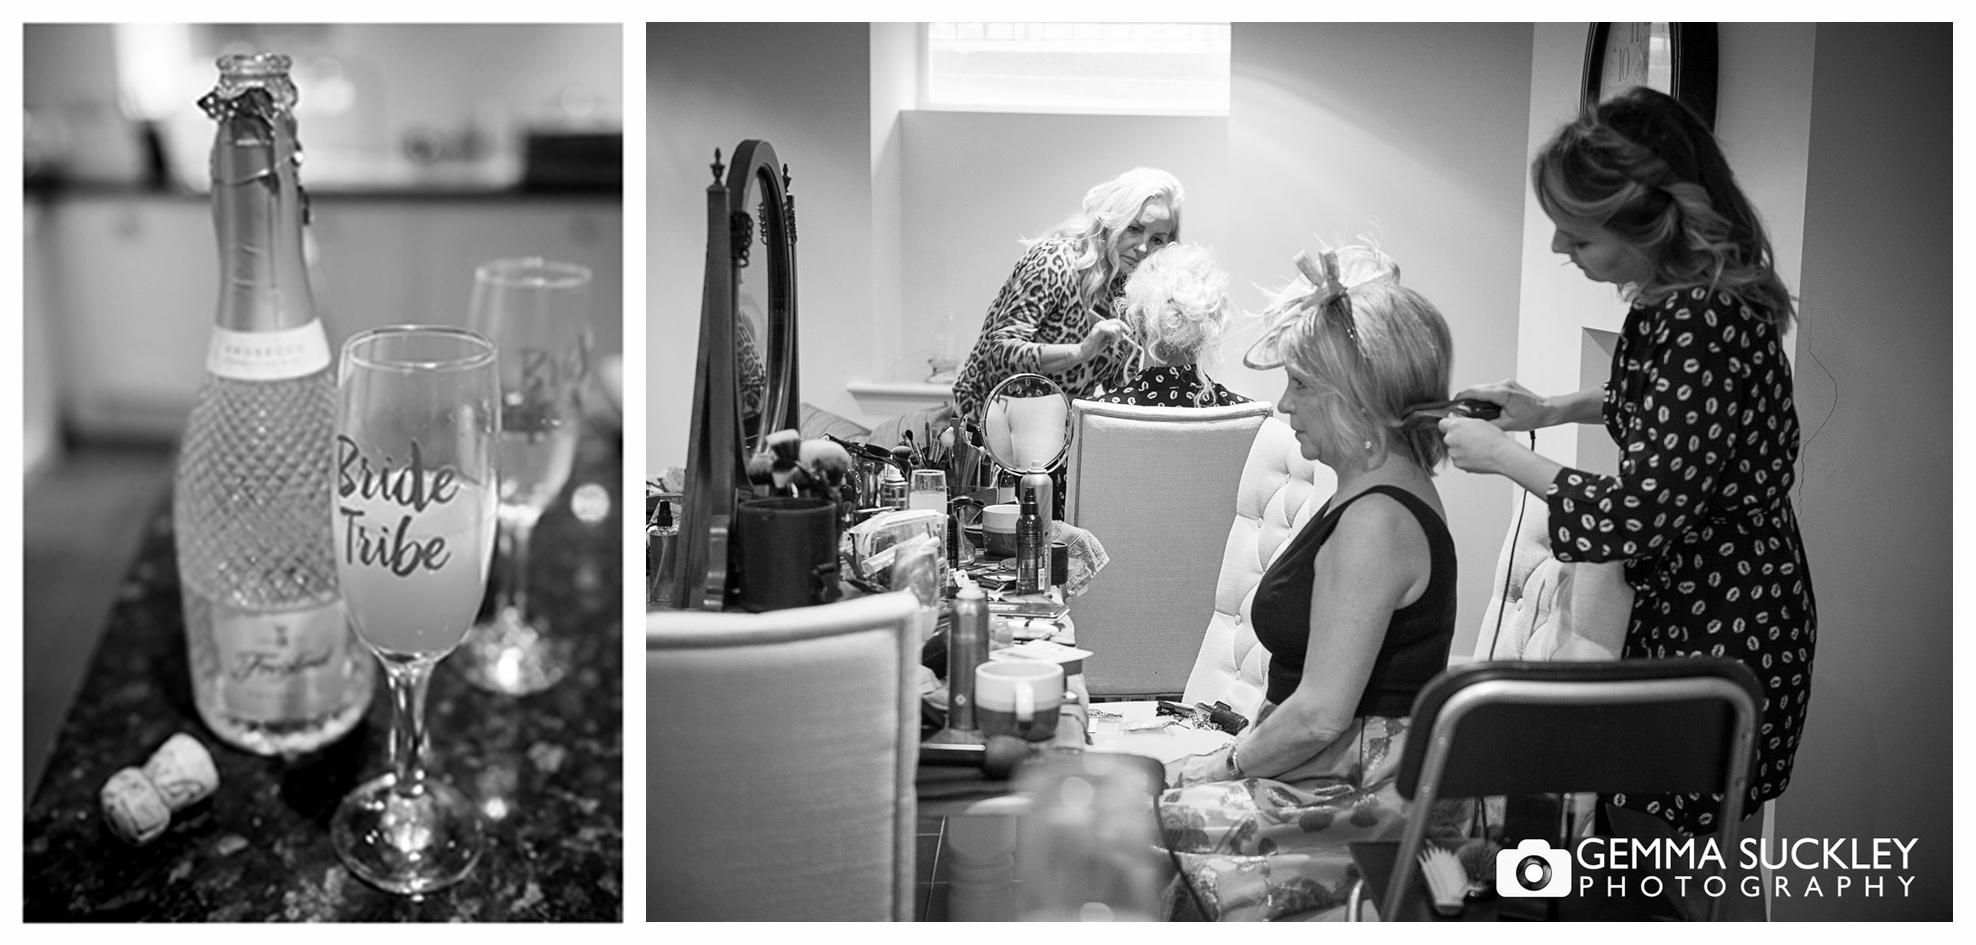 bridal-preparation-ilkley-weding.jpg